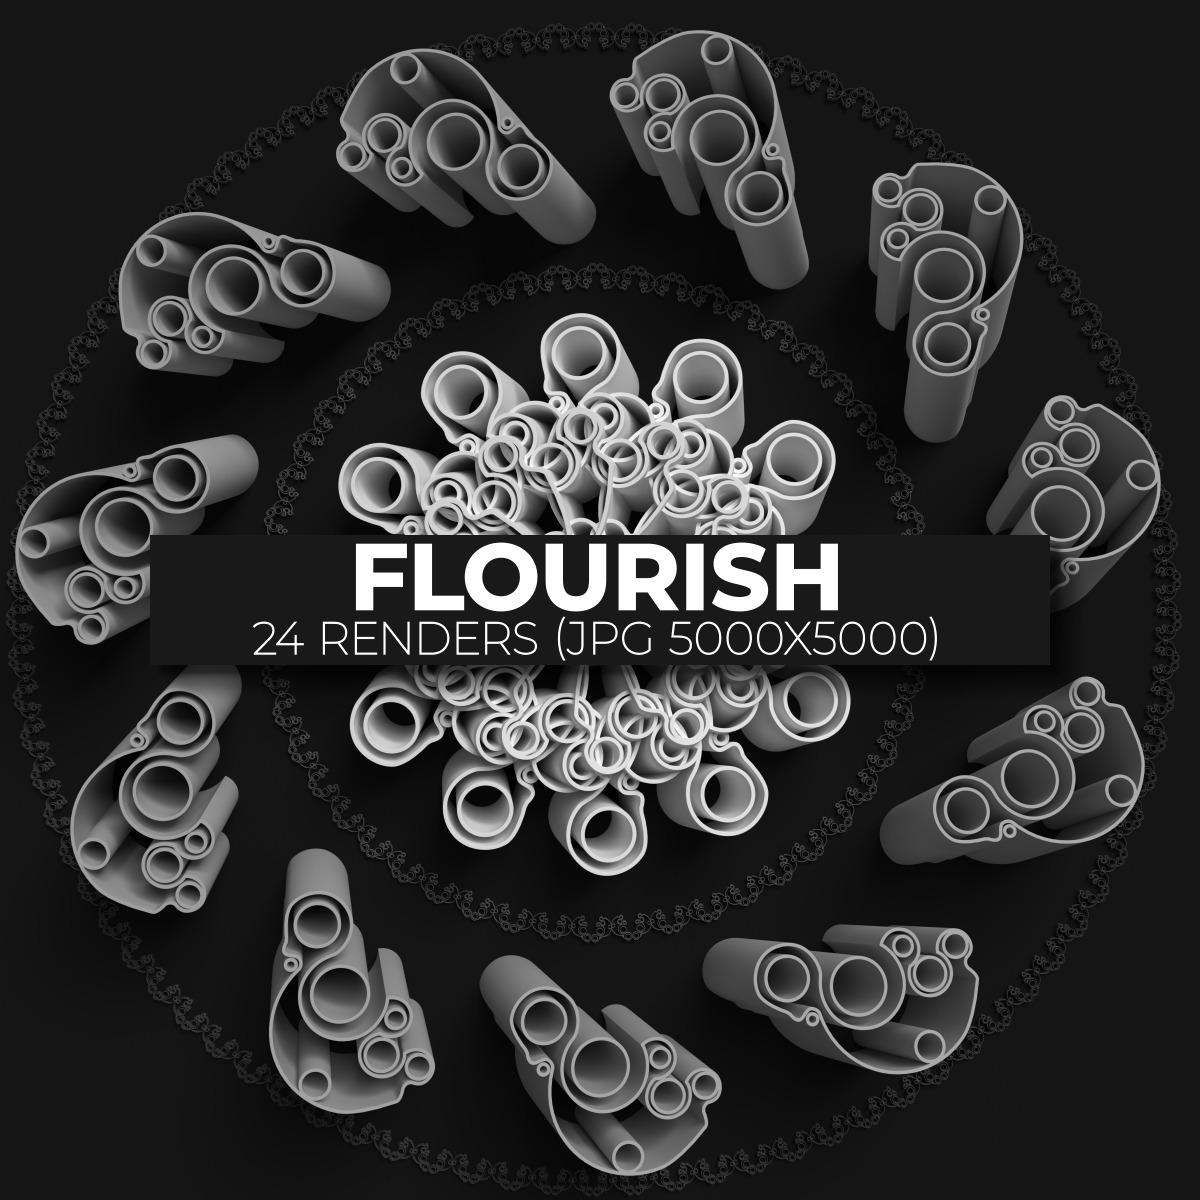 Flourish Sculptures